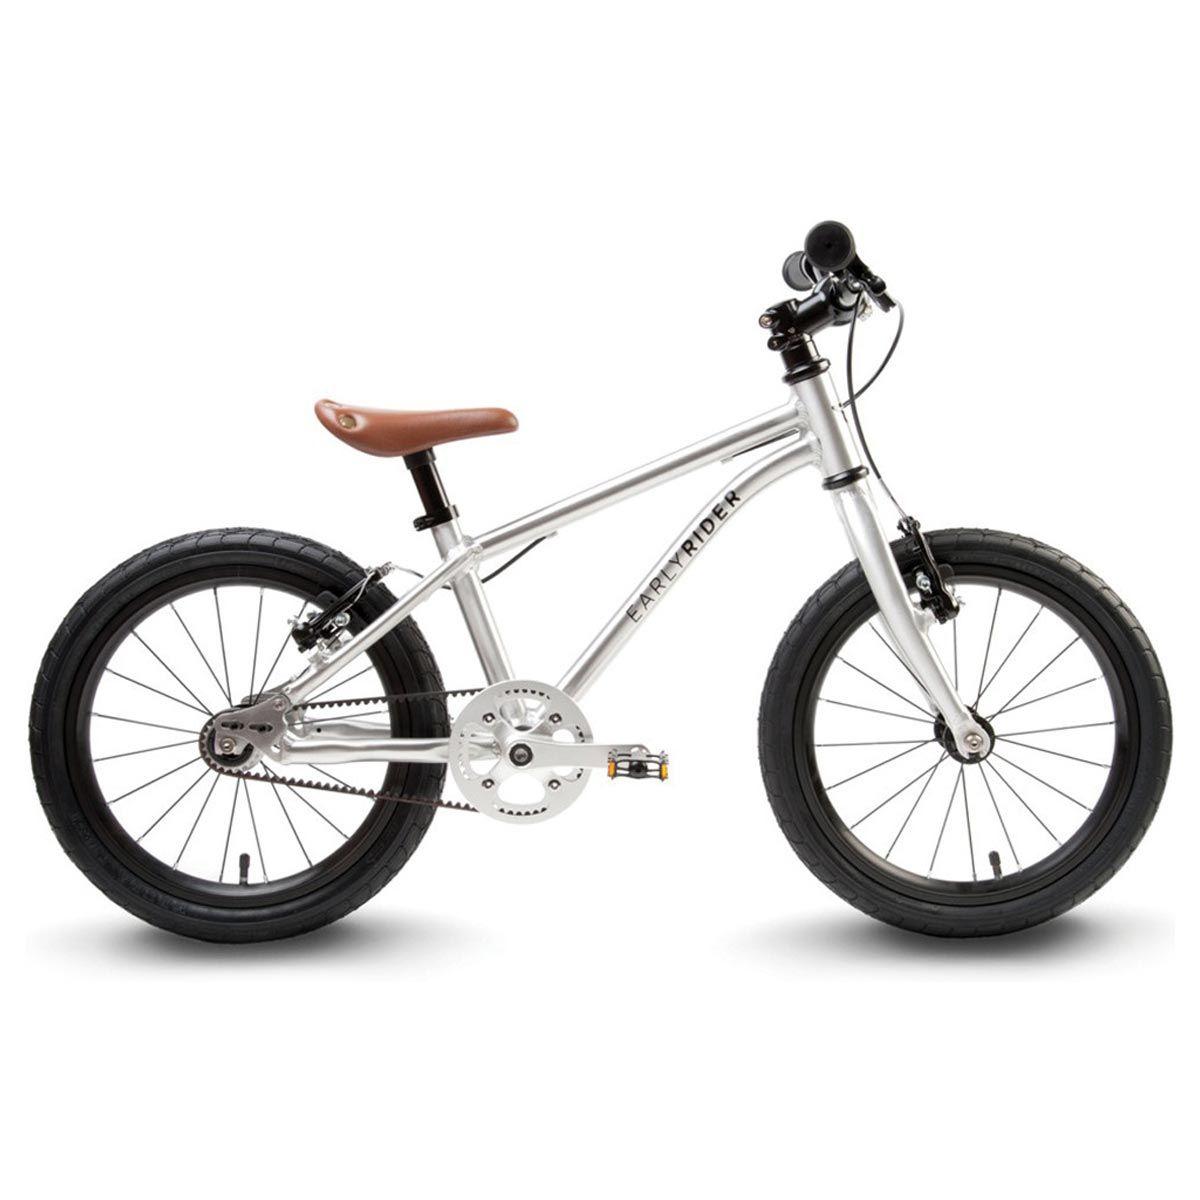 2016 Early Rider Belter 16 Inch Kids Bike Kids Bike Balance